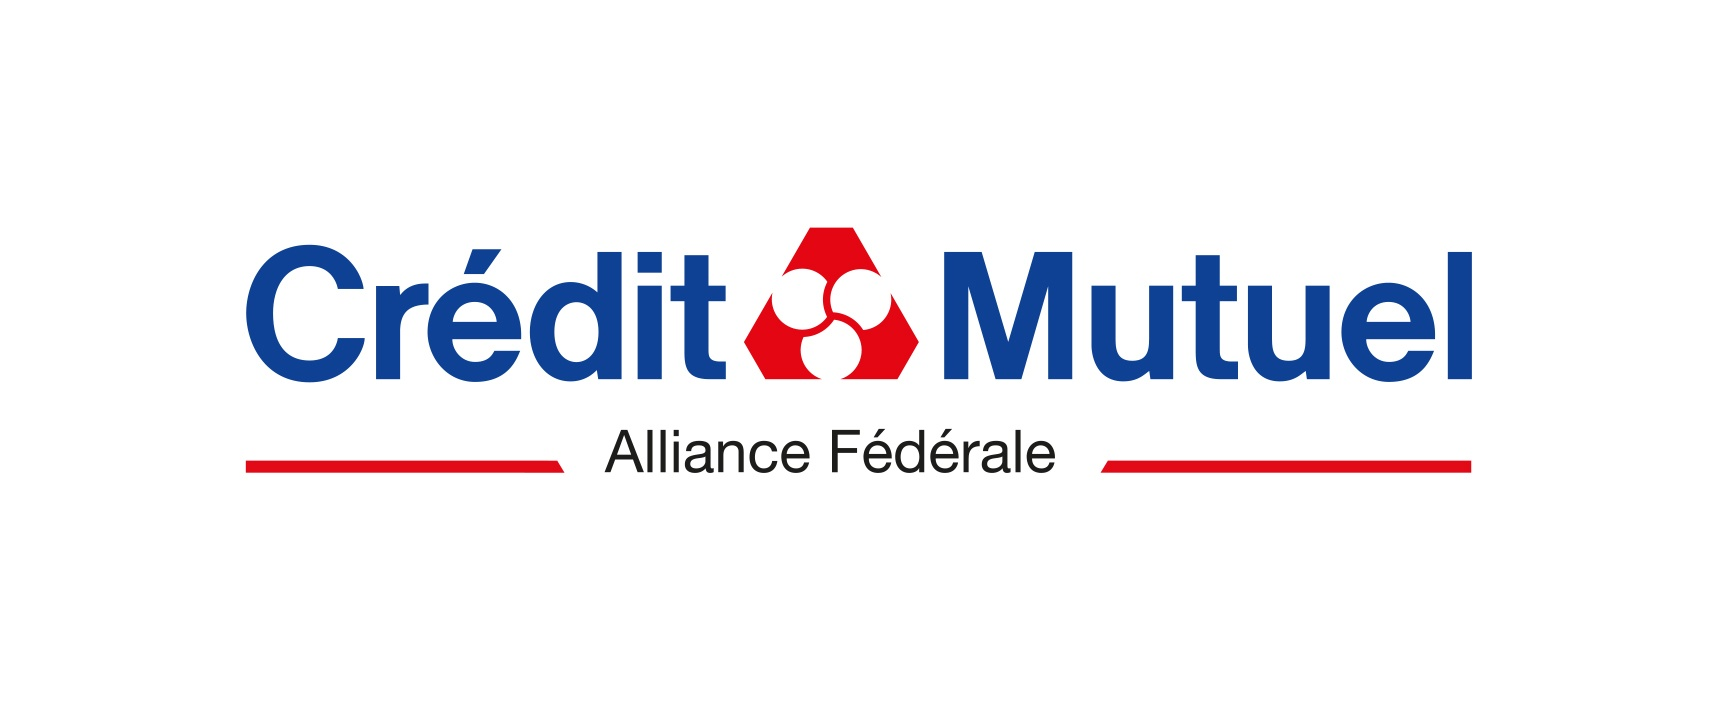 Alliance Féderale